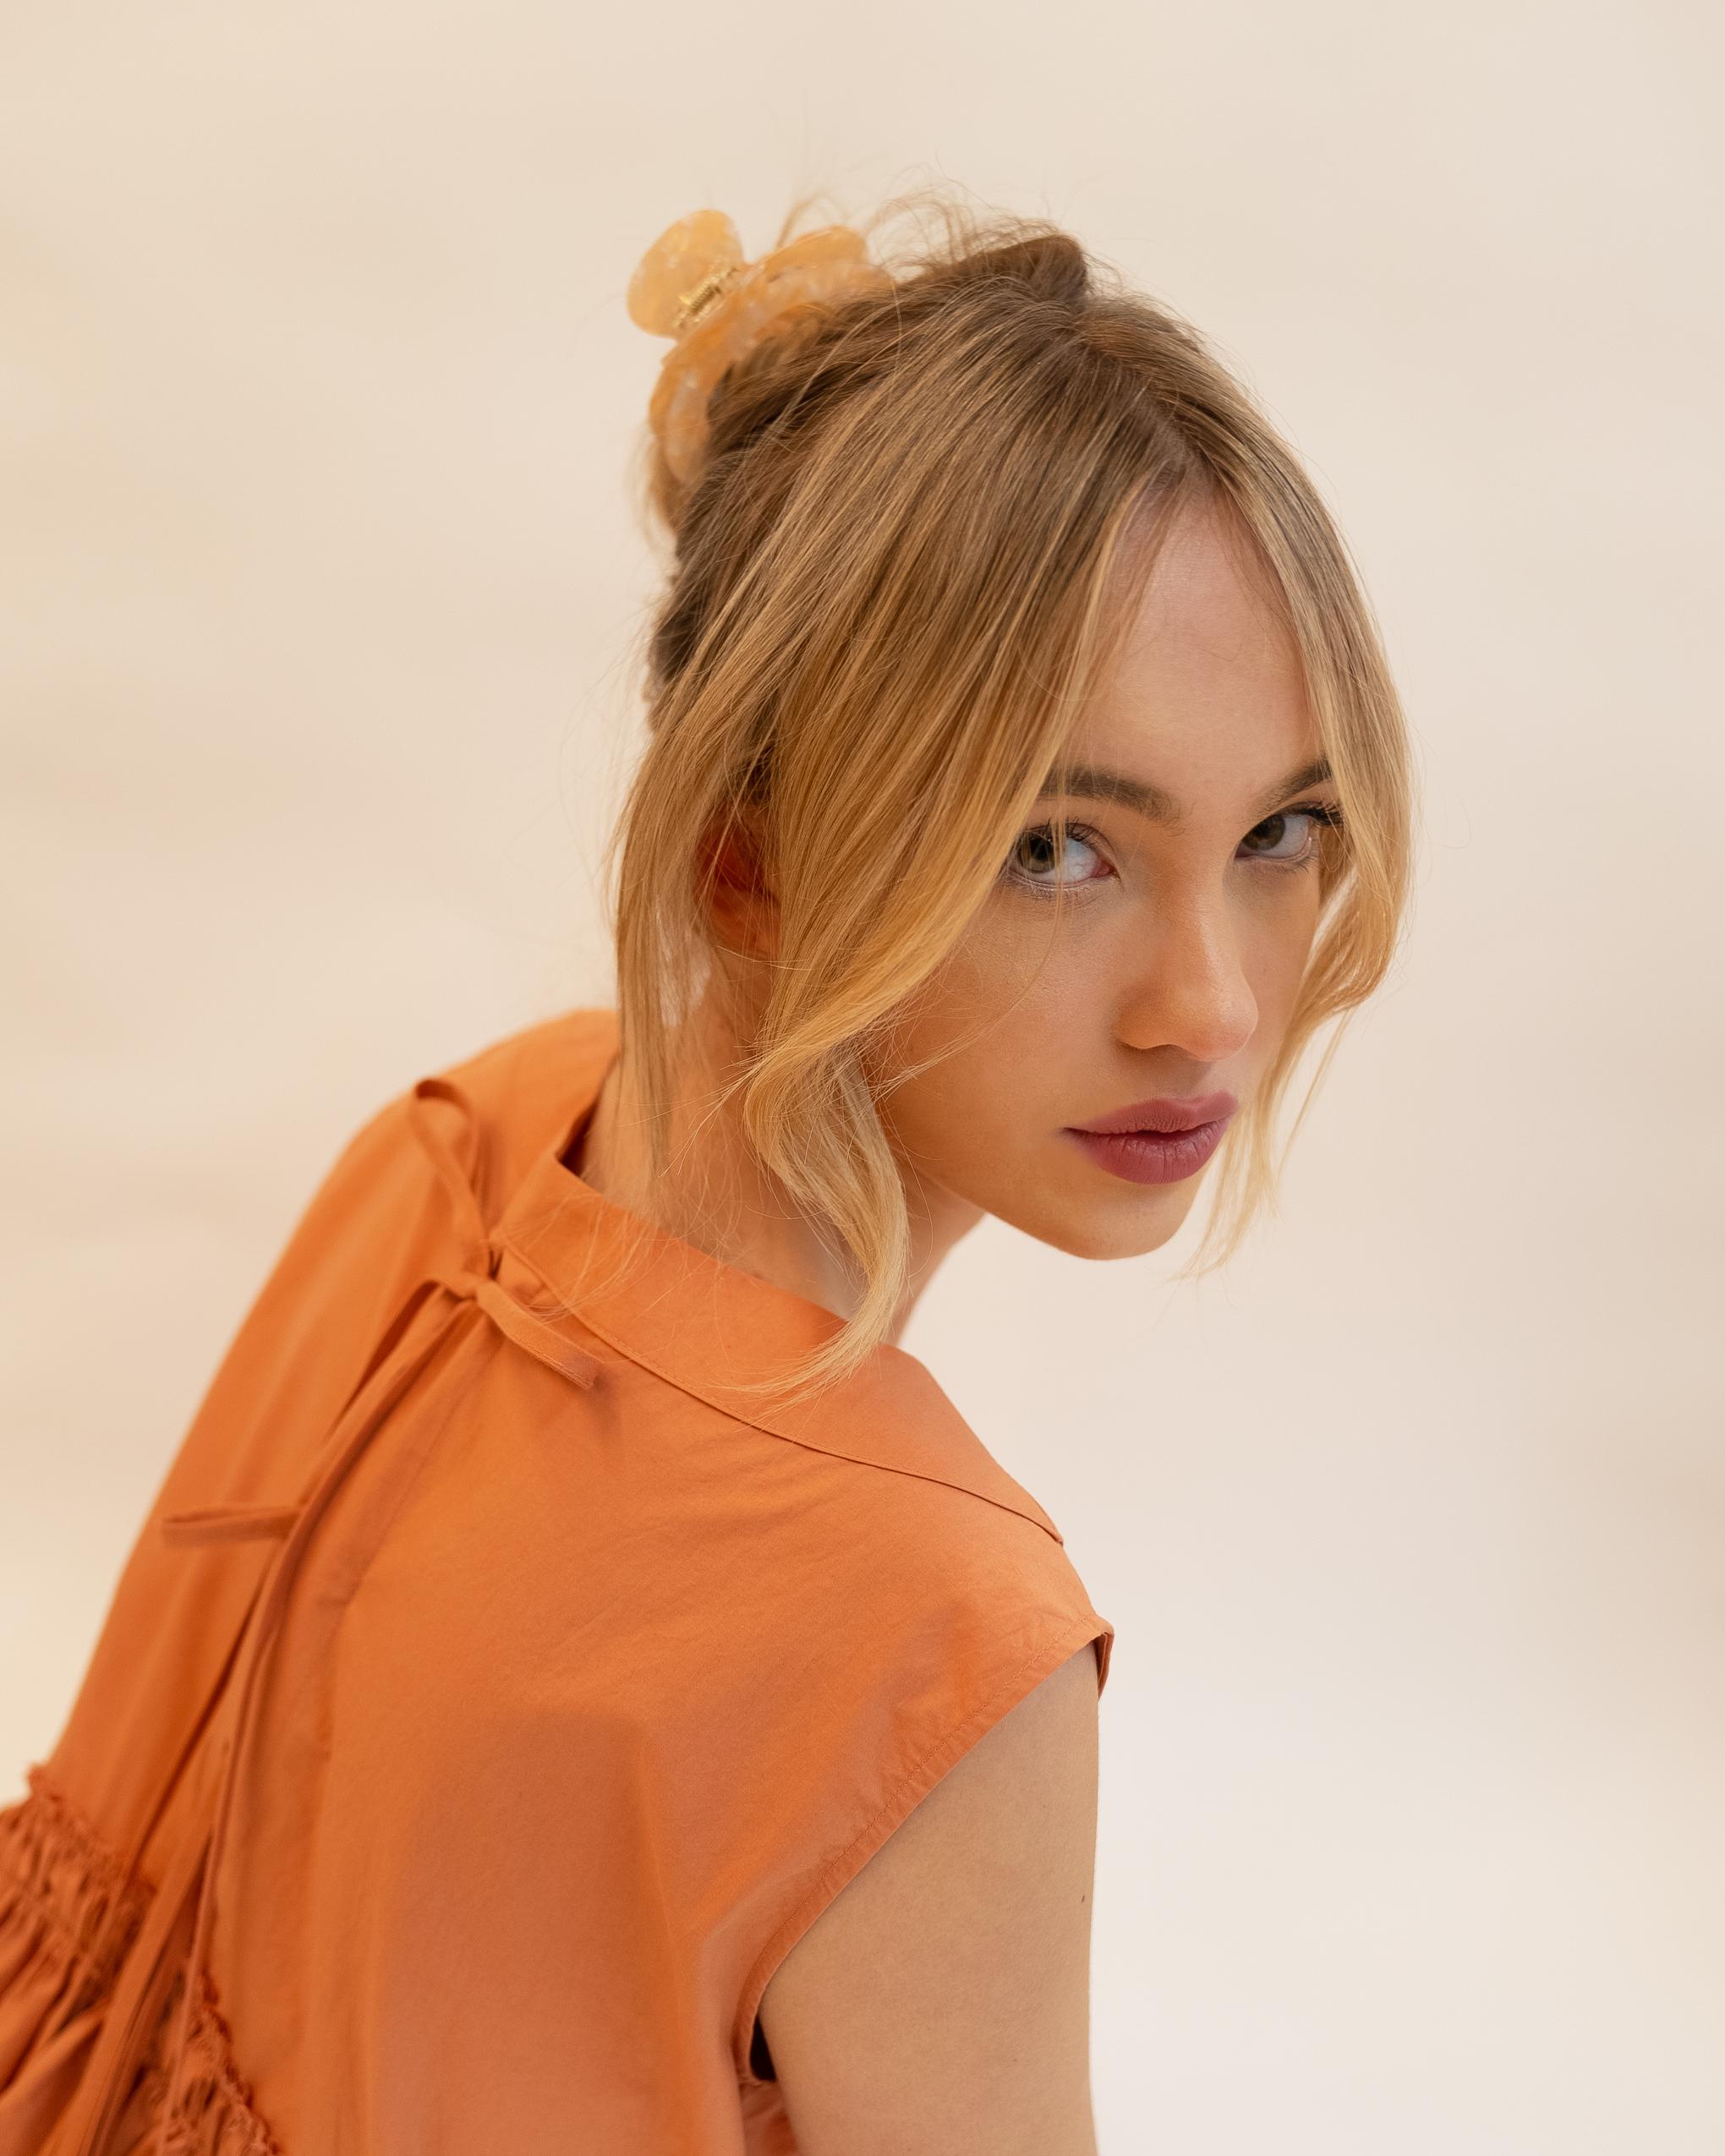 Model wearing Emin + Paul coral opal cut-out hair claw.